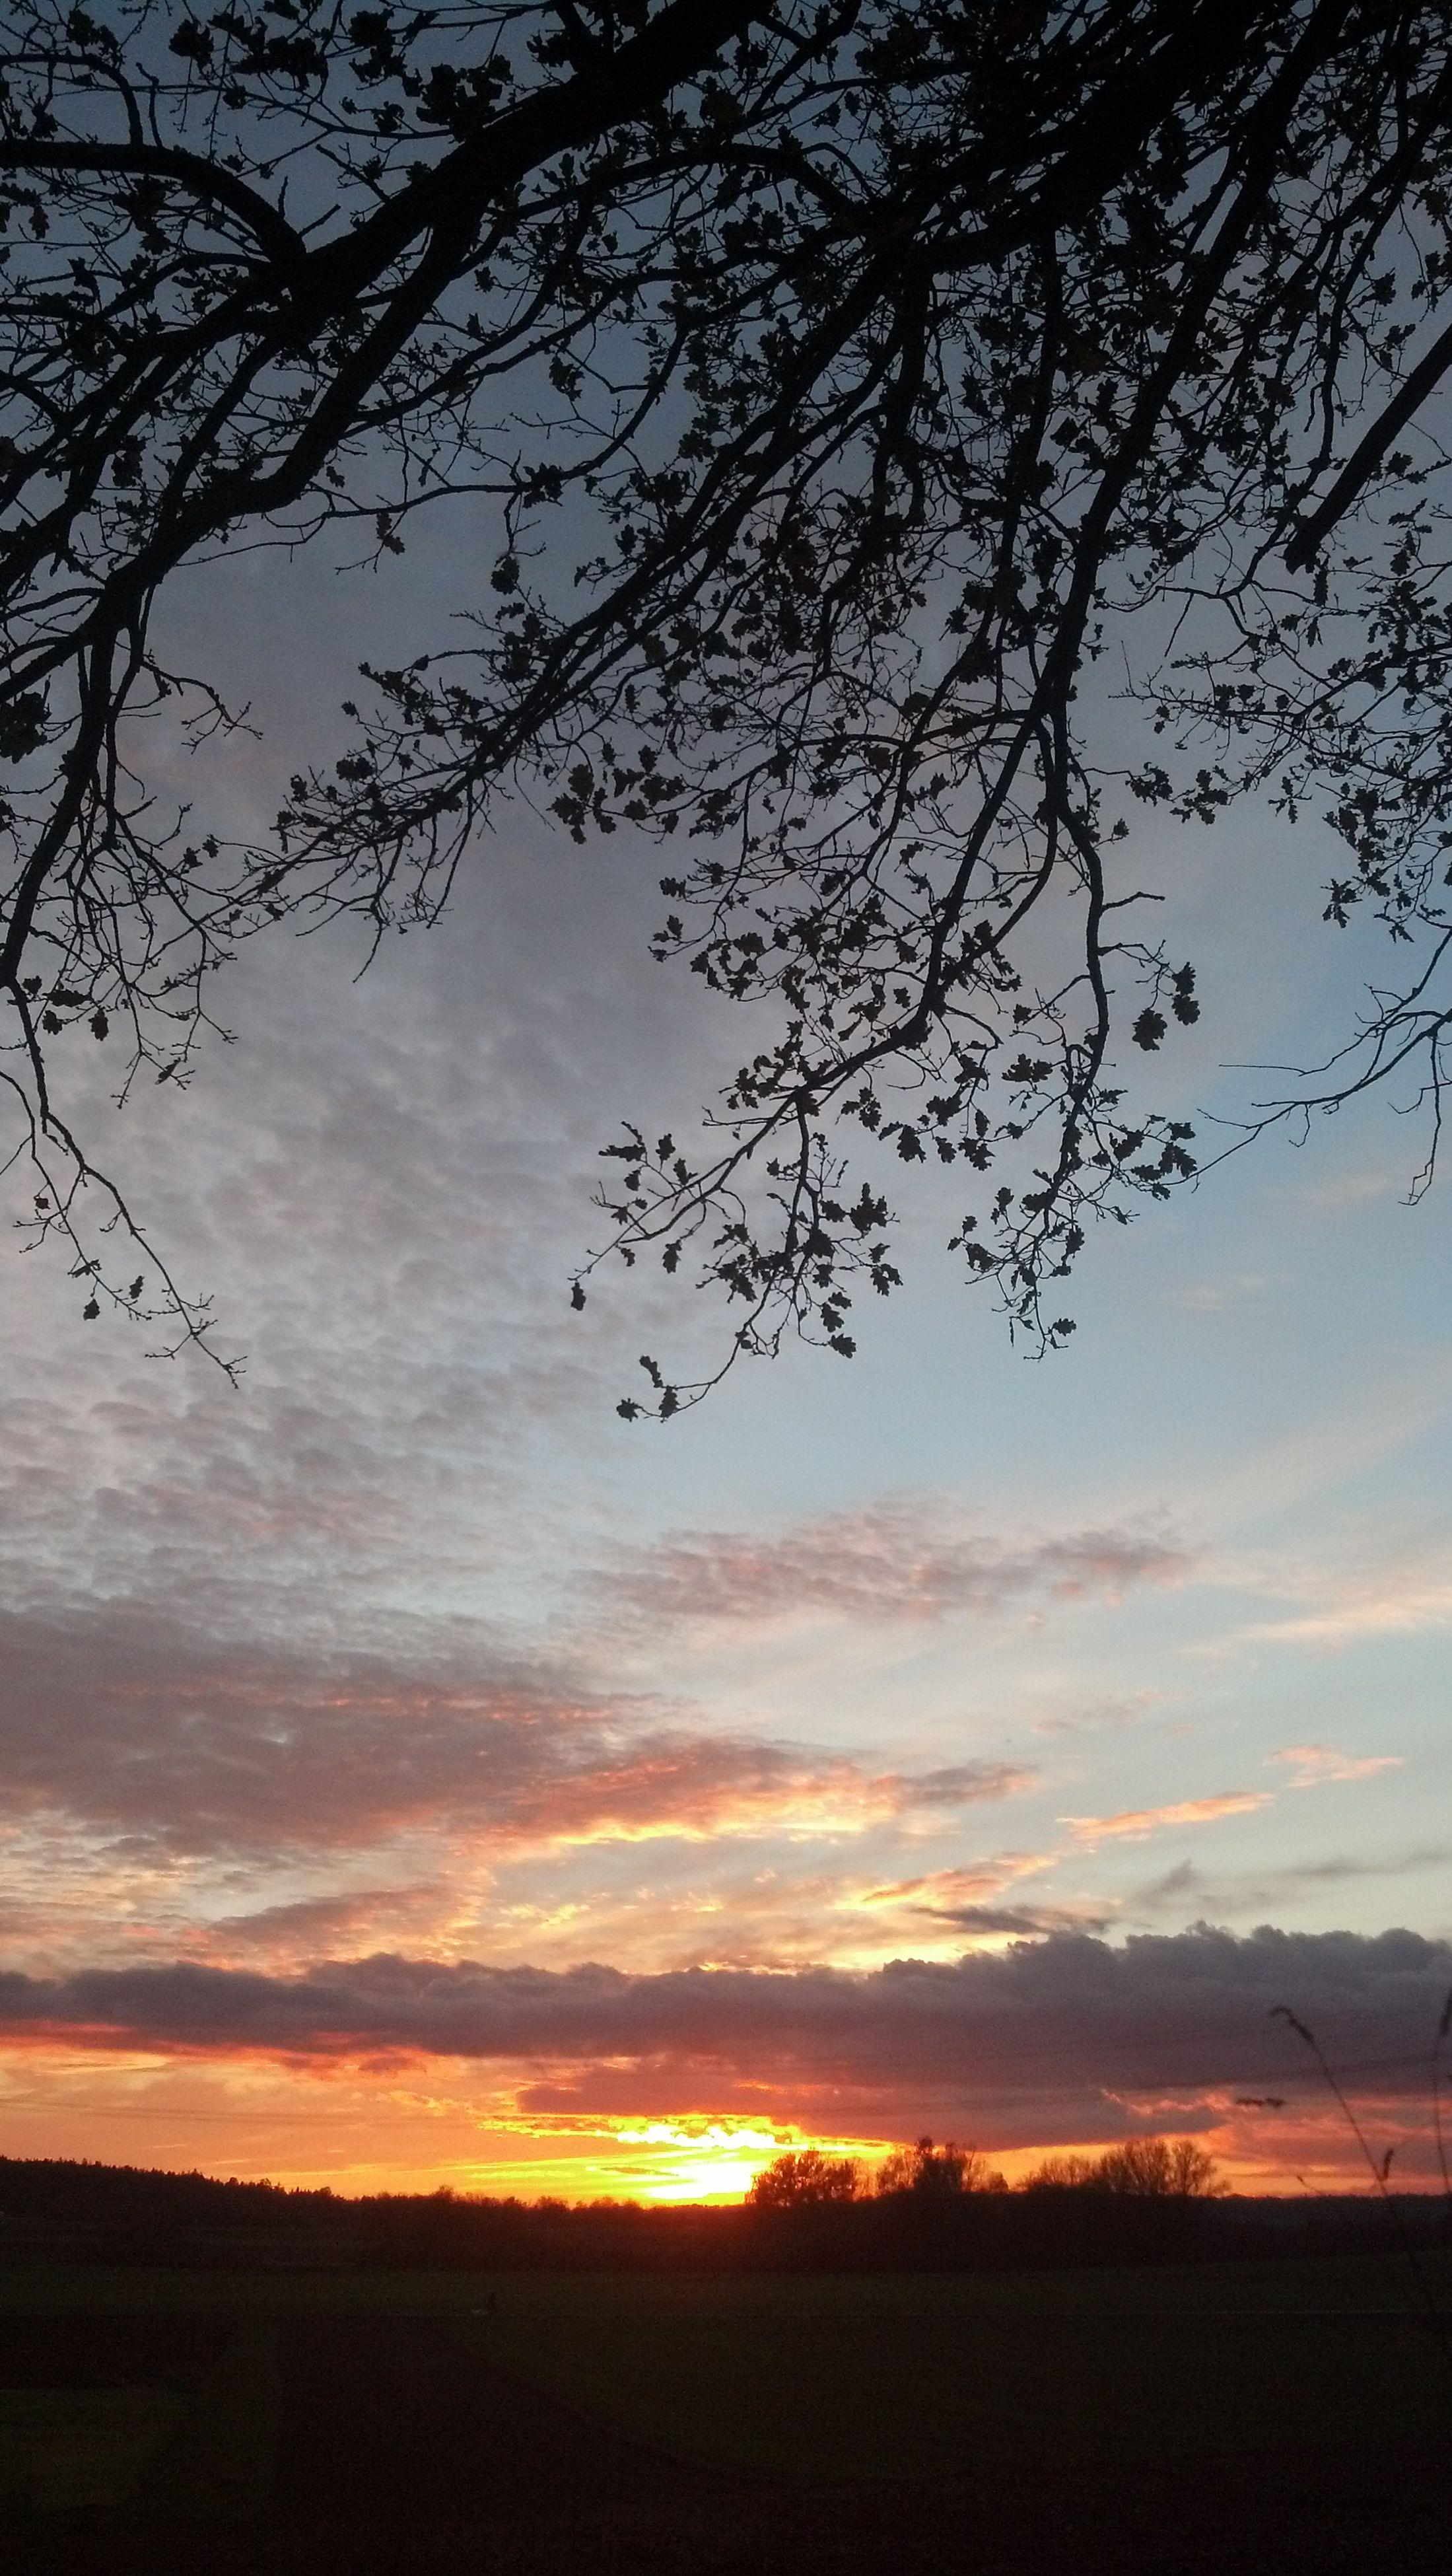 sunset, tranquil scene, tranquility, sky, scenics, landscape, silhouette, beauty in nature, field, nature, tree, cloud - sky, idyllic, bare tree, cloud, horizon over land, sun, non-urban scene, orange color, outdoors